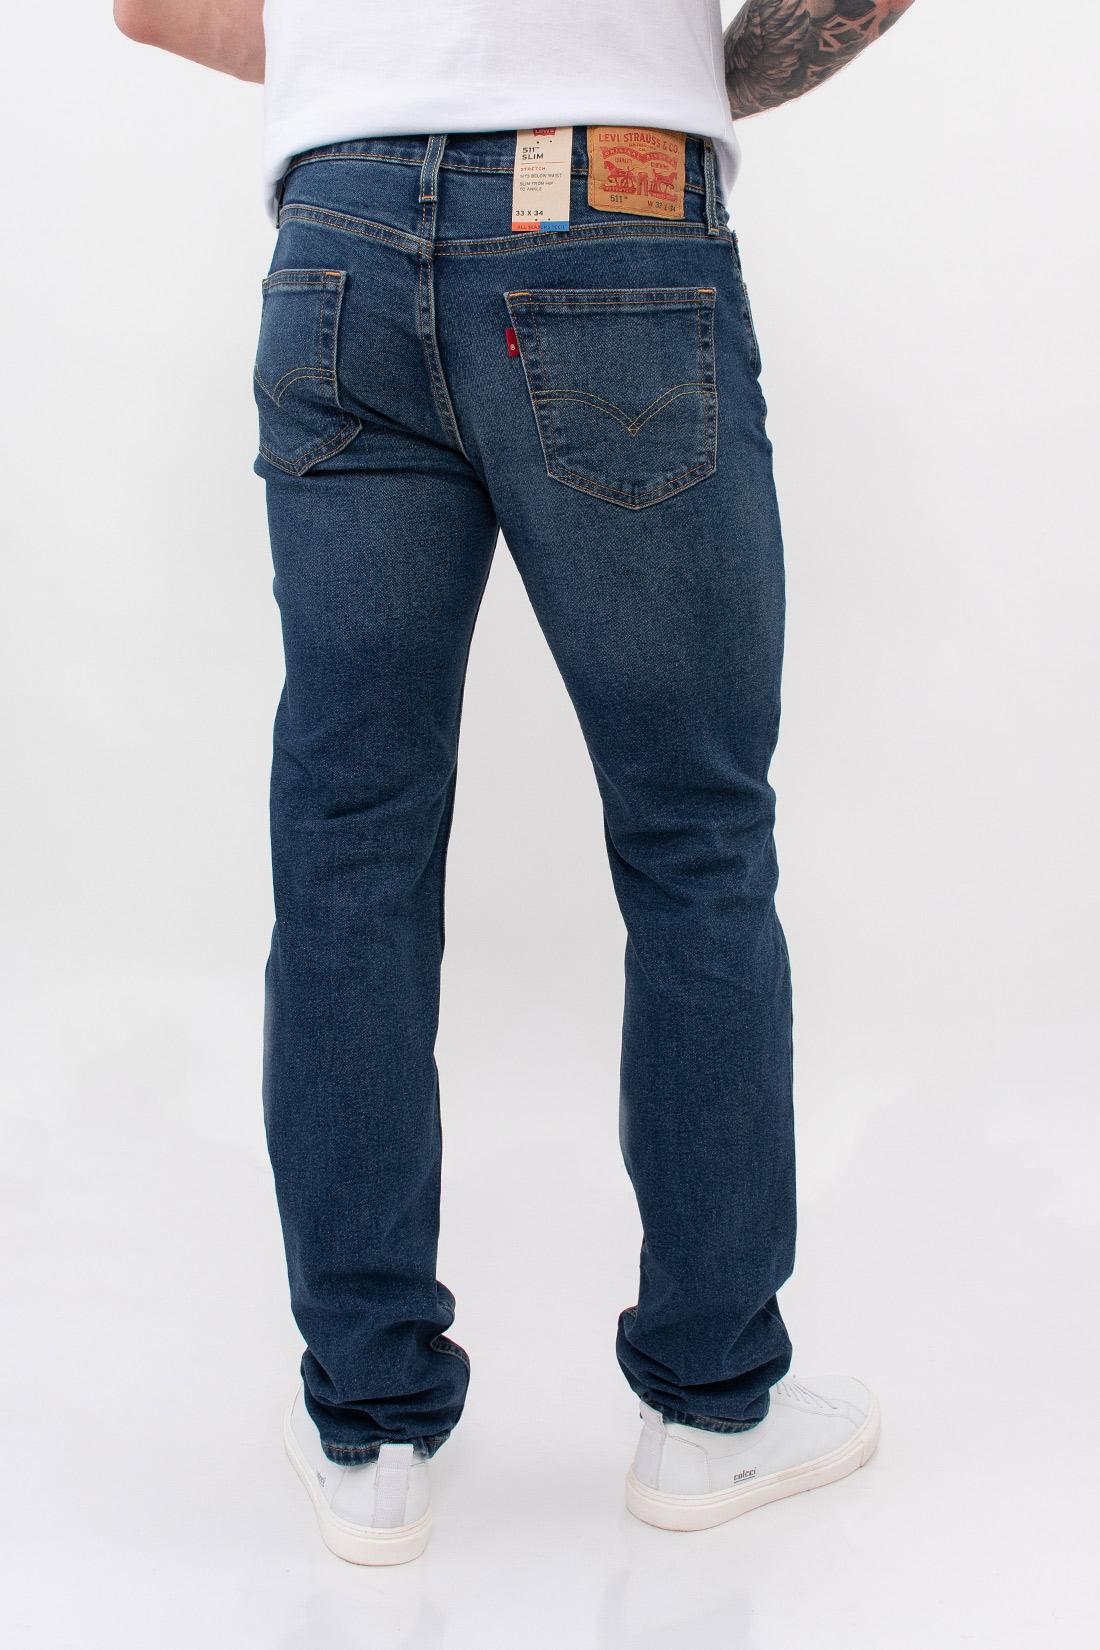 Calca Jeans Levis 511 Slim All Seasons Tech